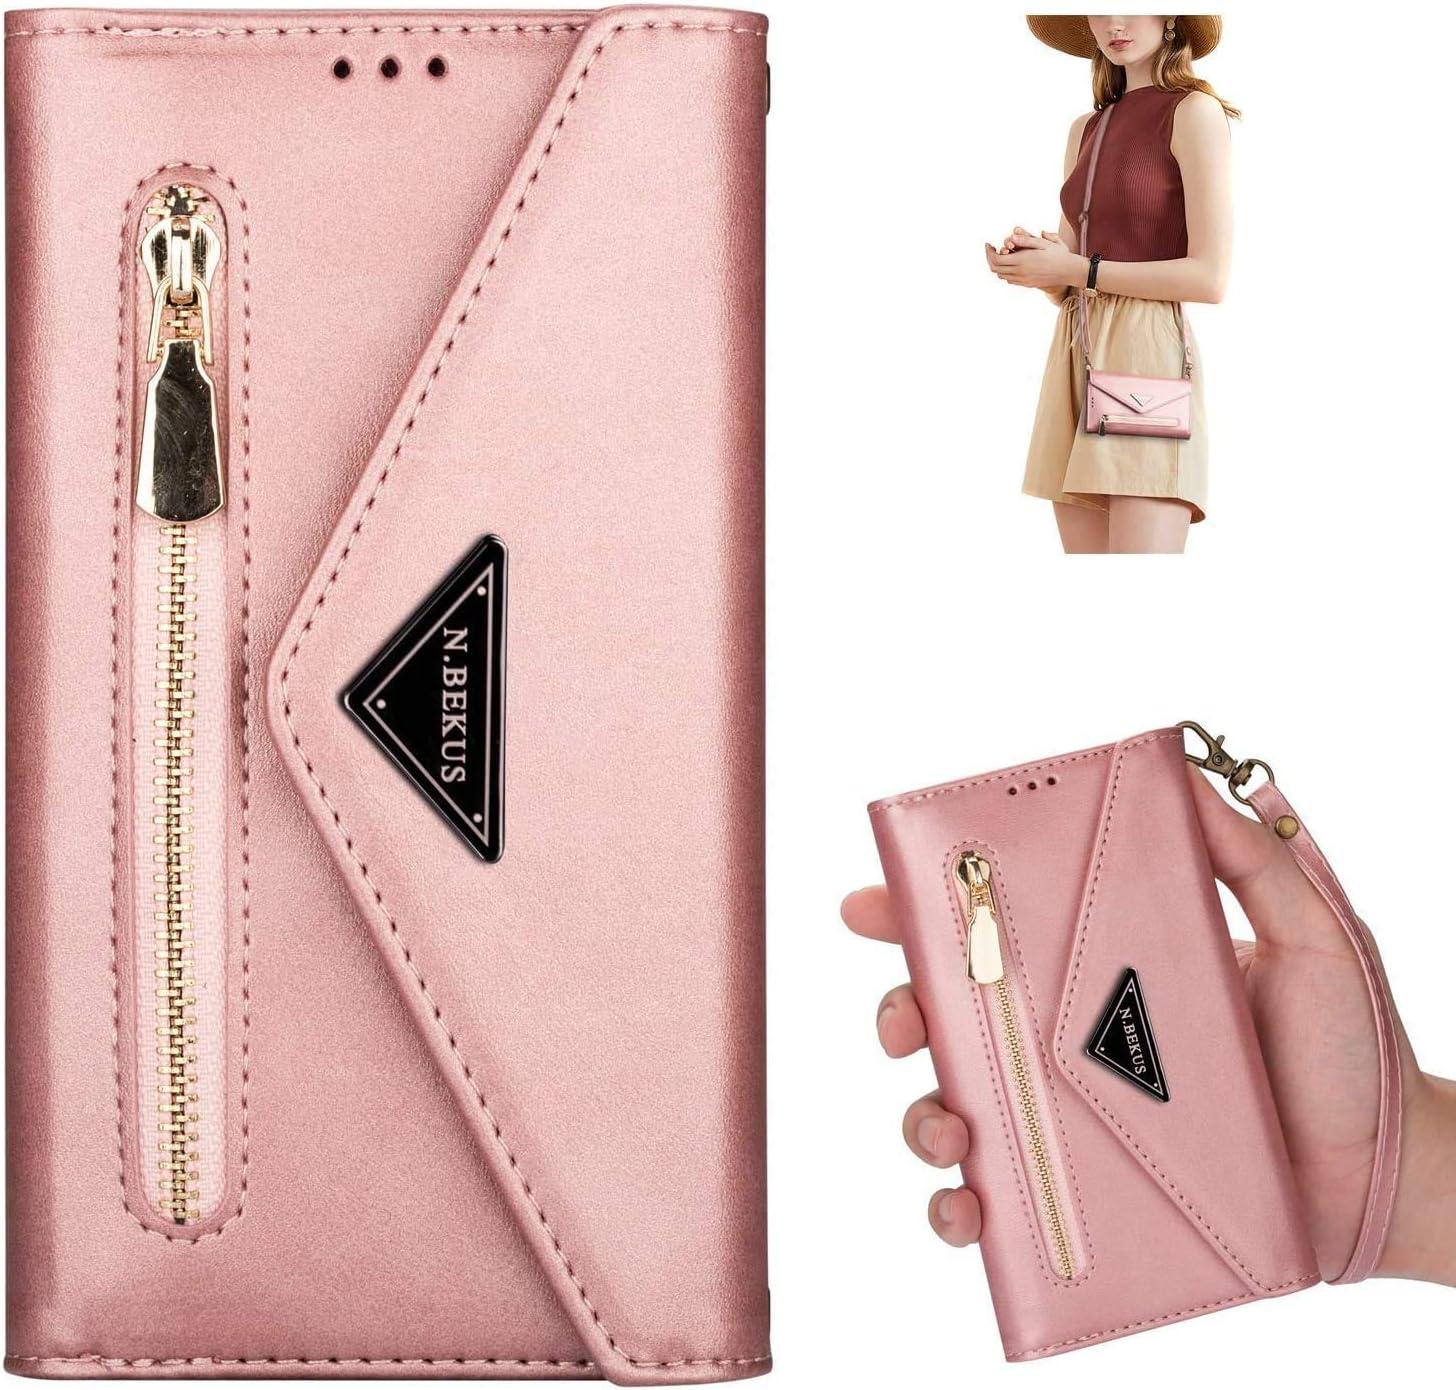 PHEZEN Crossbody Phone Case Manufacturer OFFicial shop for Many popular brands Samsung Note Galaxy 9 Cas Wallet